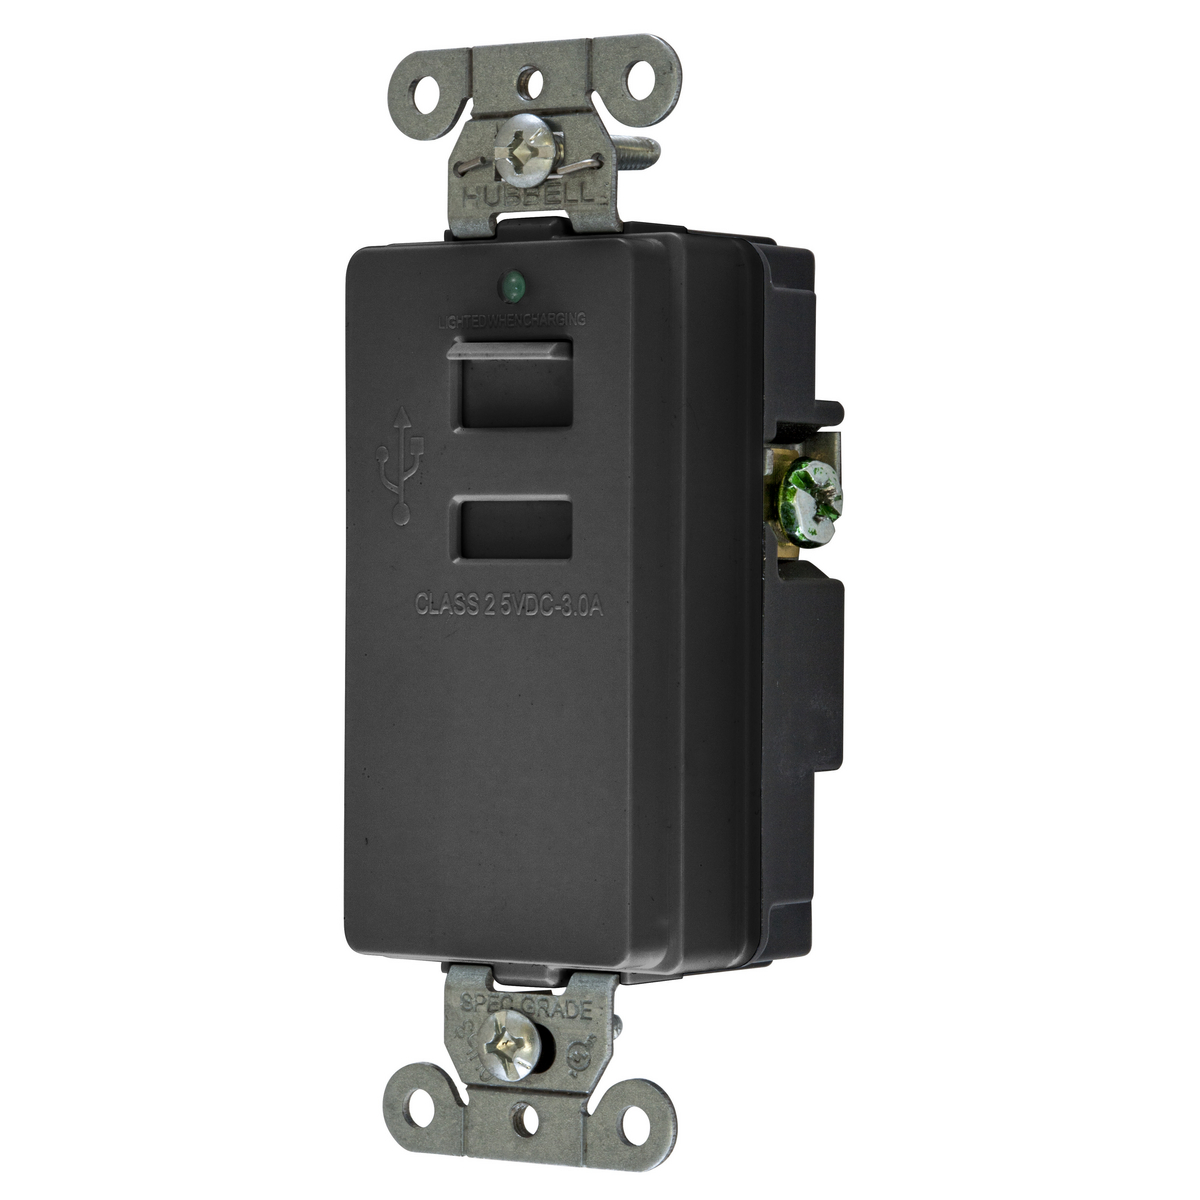 Hubbell USB2BK USB CHRGR 2 PORT 3A 5 V BLACK